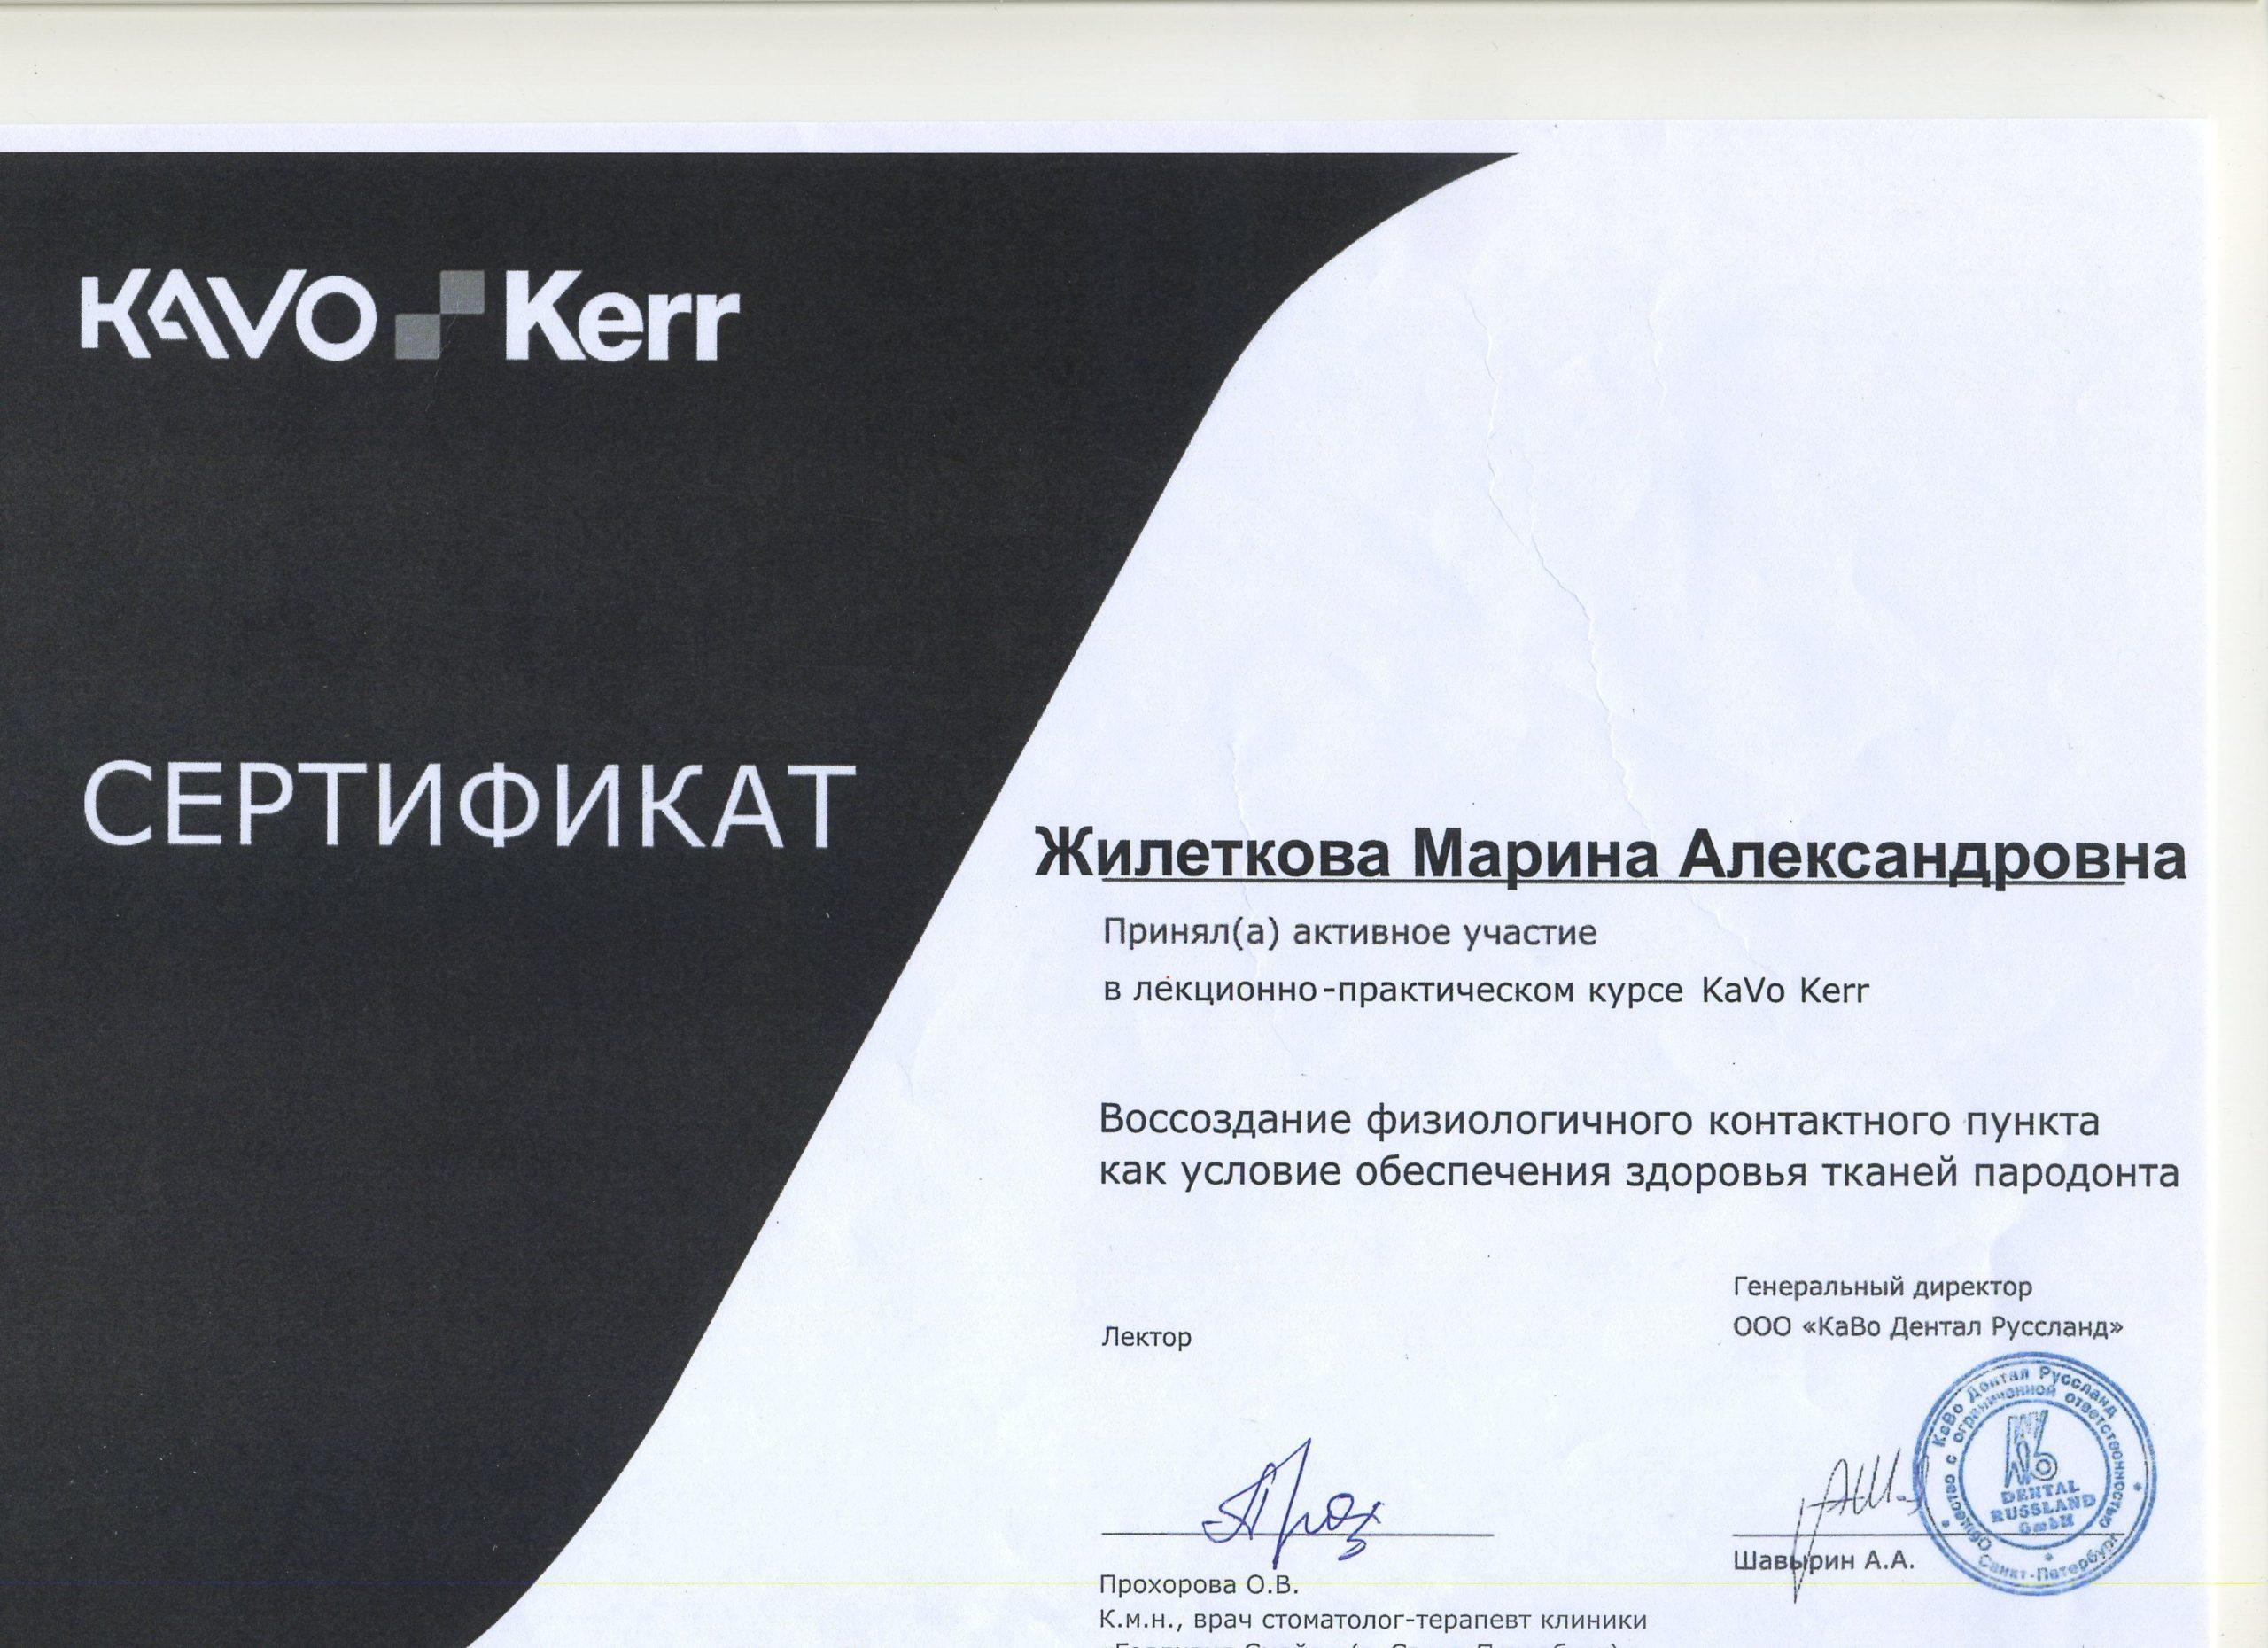 Сертифиат Жилеткова Марина Александровна_02